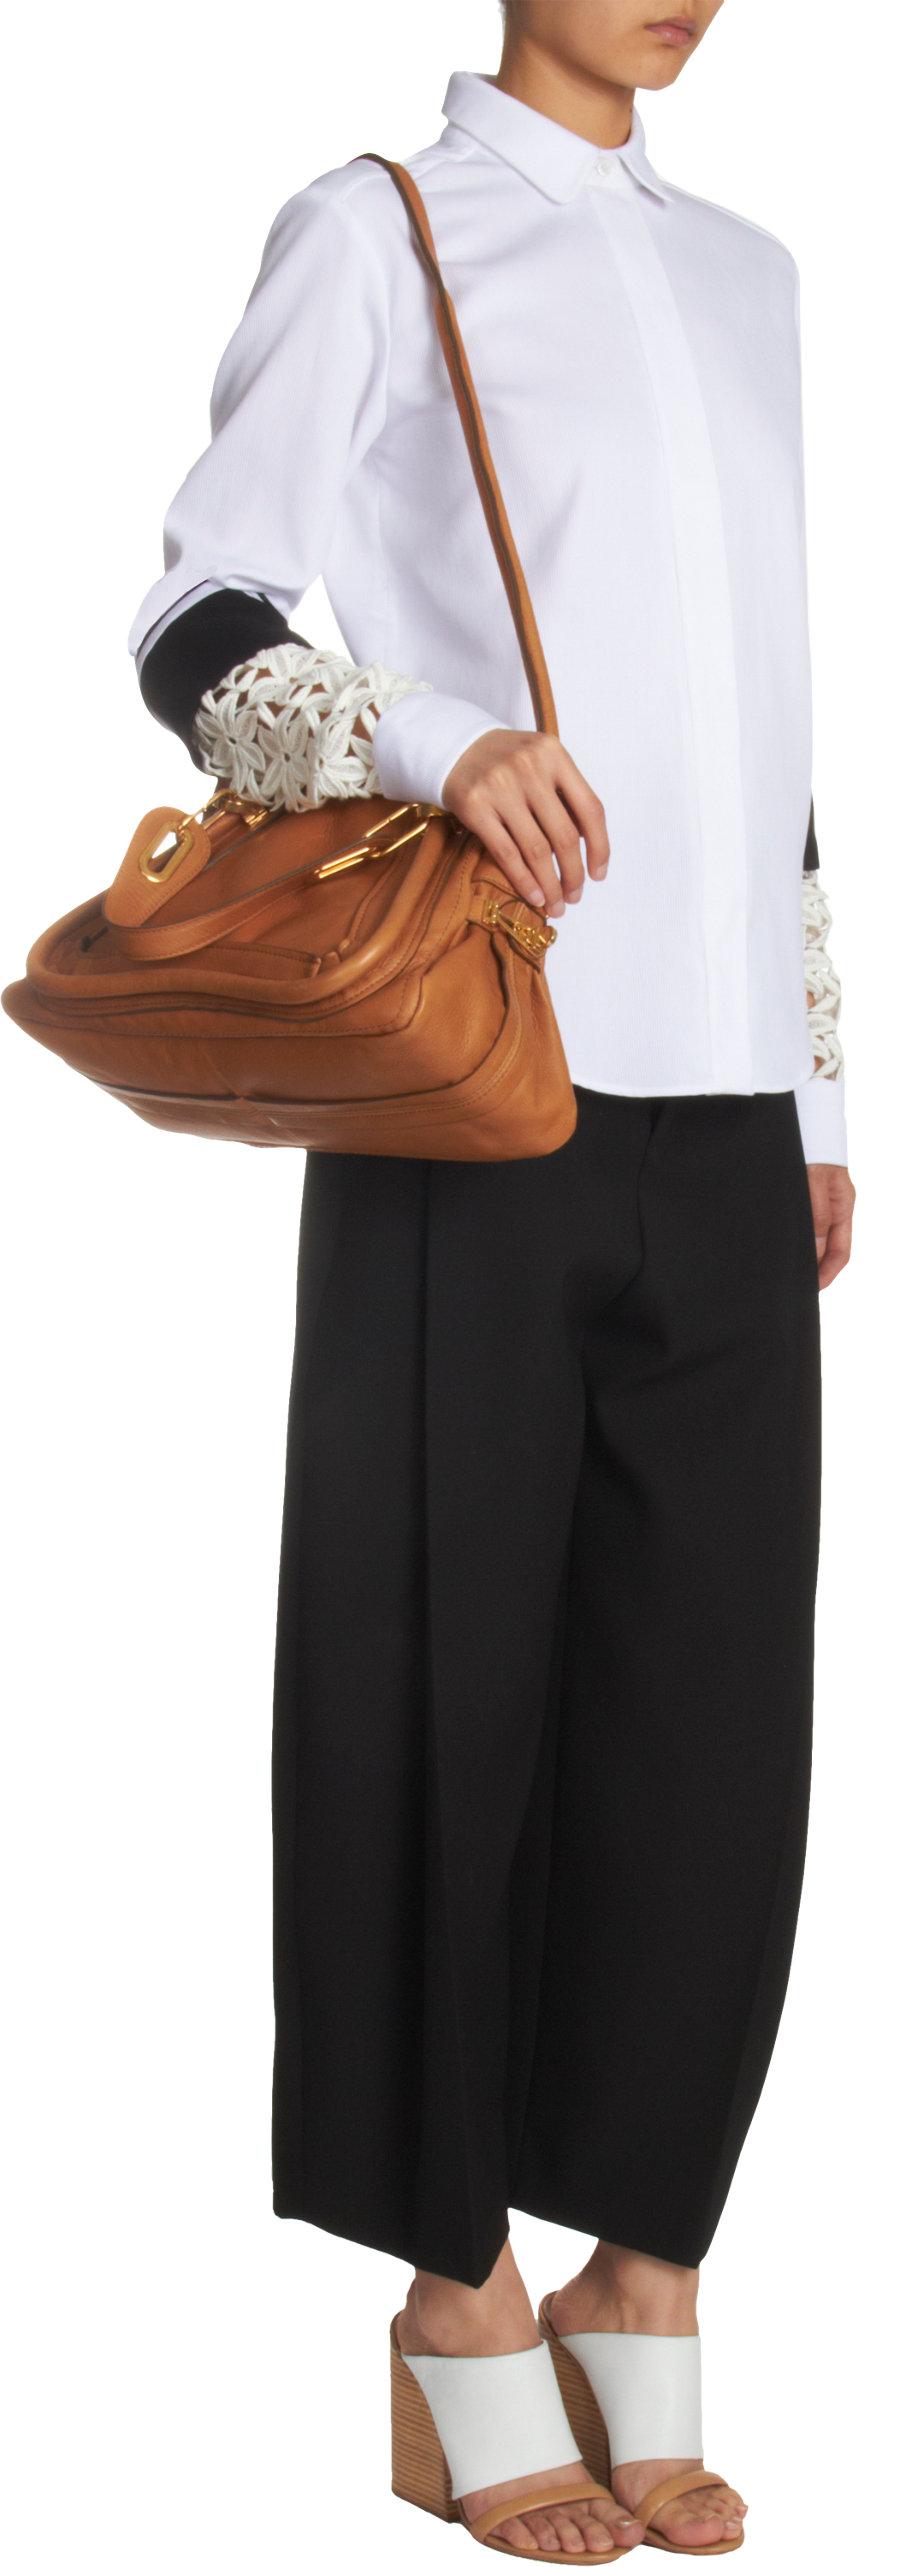 chloe satchel handbag - chloe medium paraty satchel, chloe outlet uk